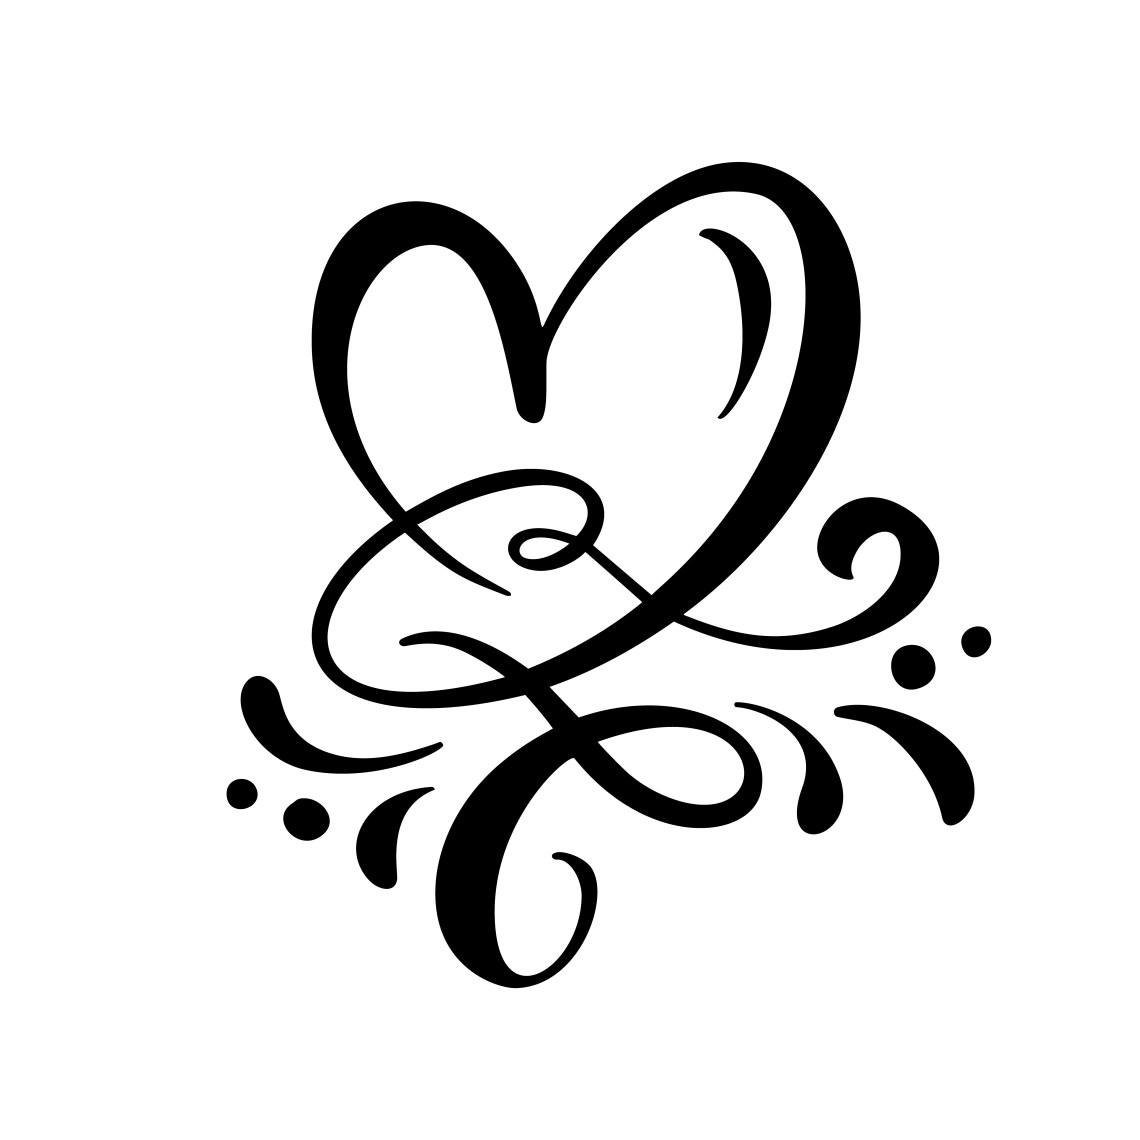 Download Heart love sign Vector illustration - Download Free ...